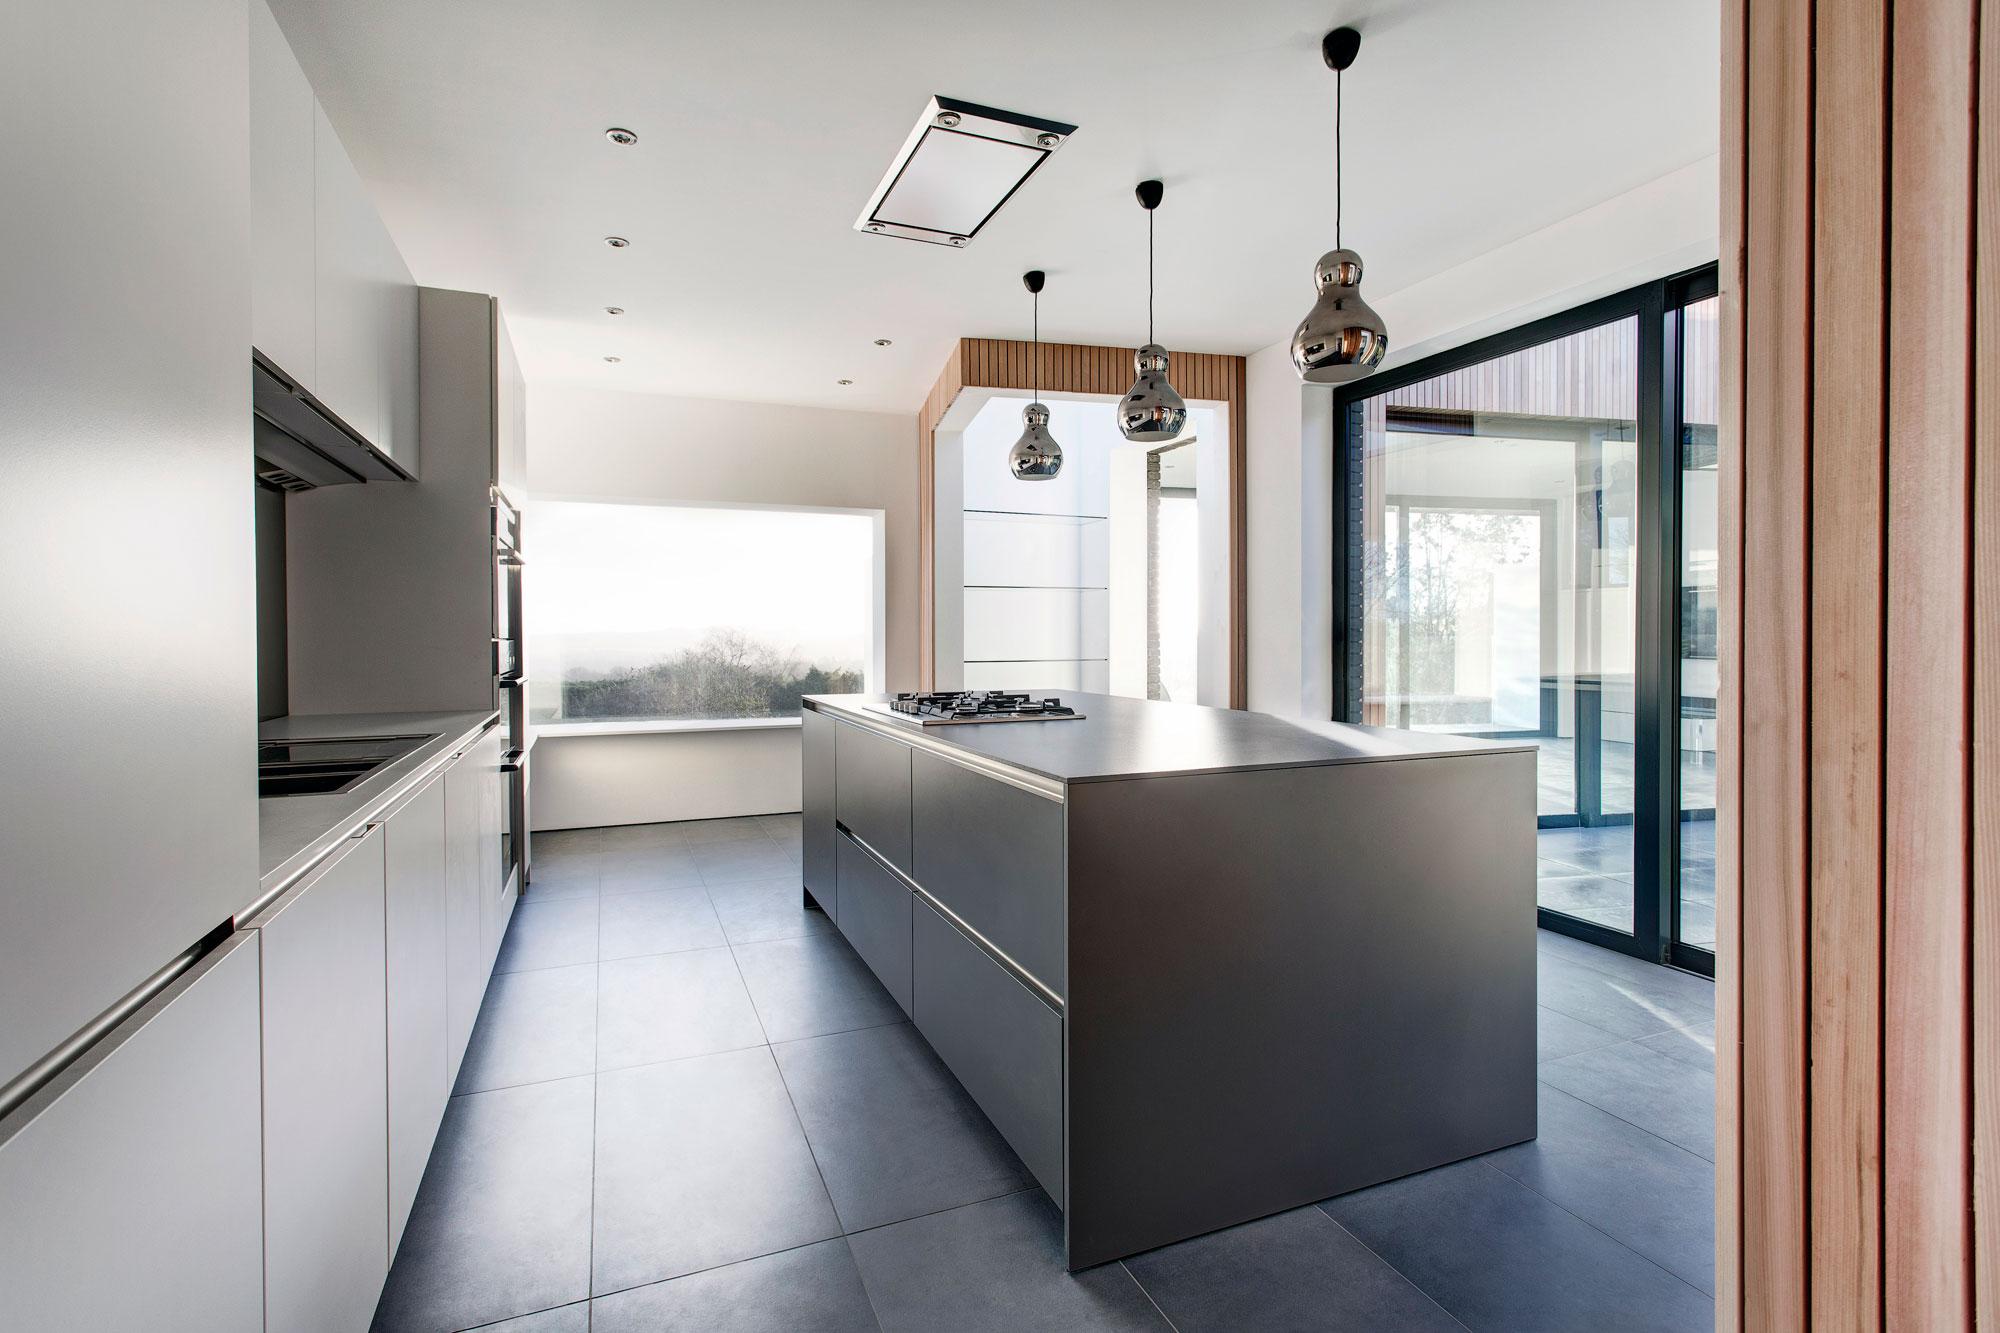 grey kitchen island home depot lights pendant lighting modern in hampshire england